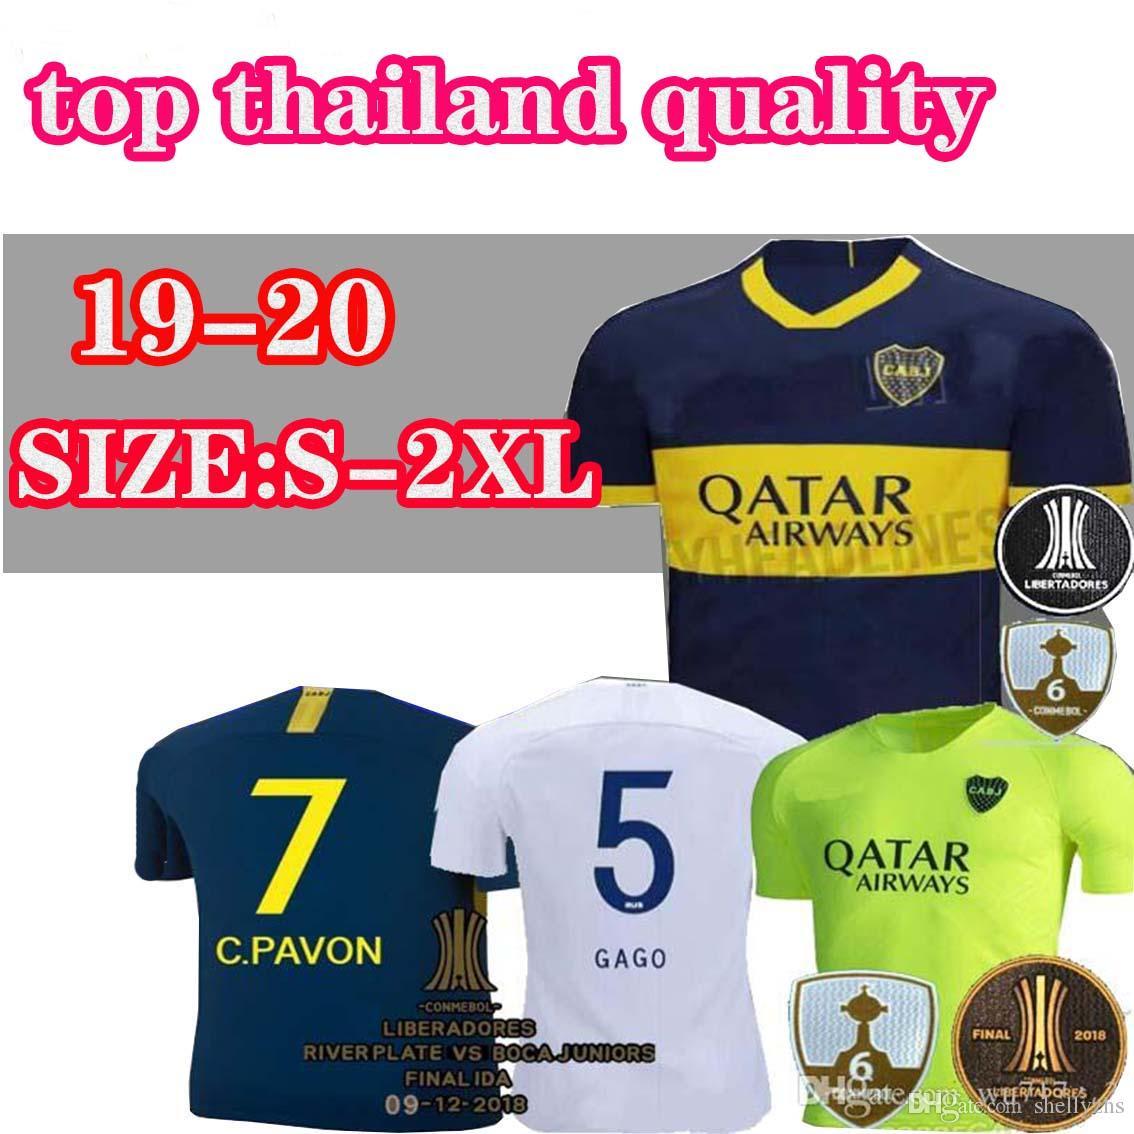 1c651ef943457 2019 New 2019/2020 Thailand Boca Juniors Home Third Green 2018 Argentine  Super League Soccer Jerseys 19/20 GAGO #5 CARDONA TEVEZ Football Shirts  From ...